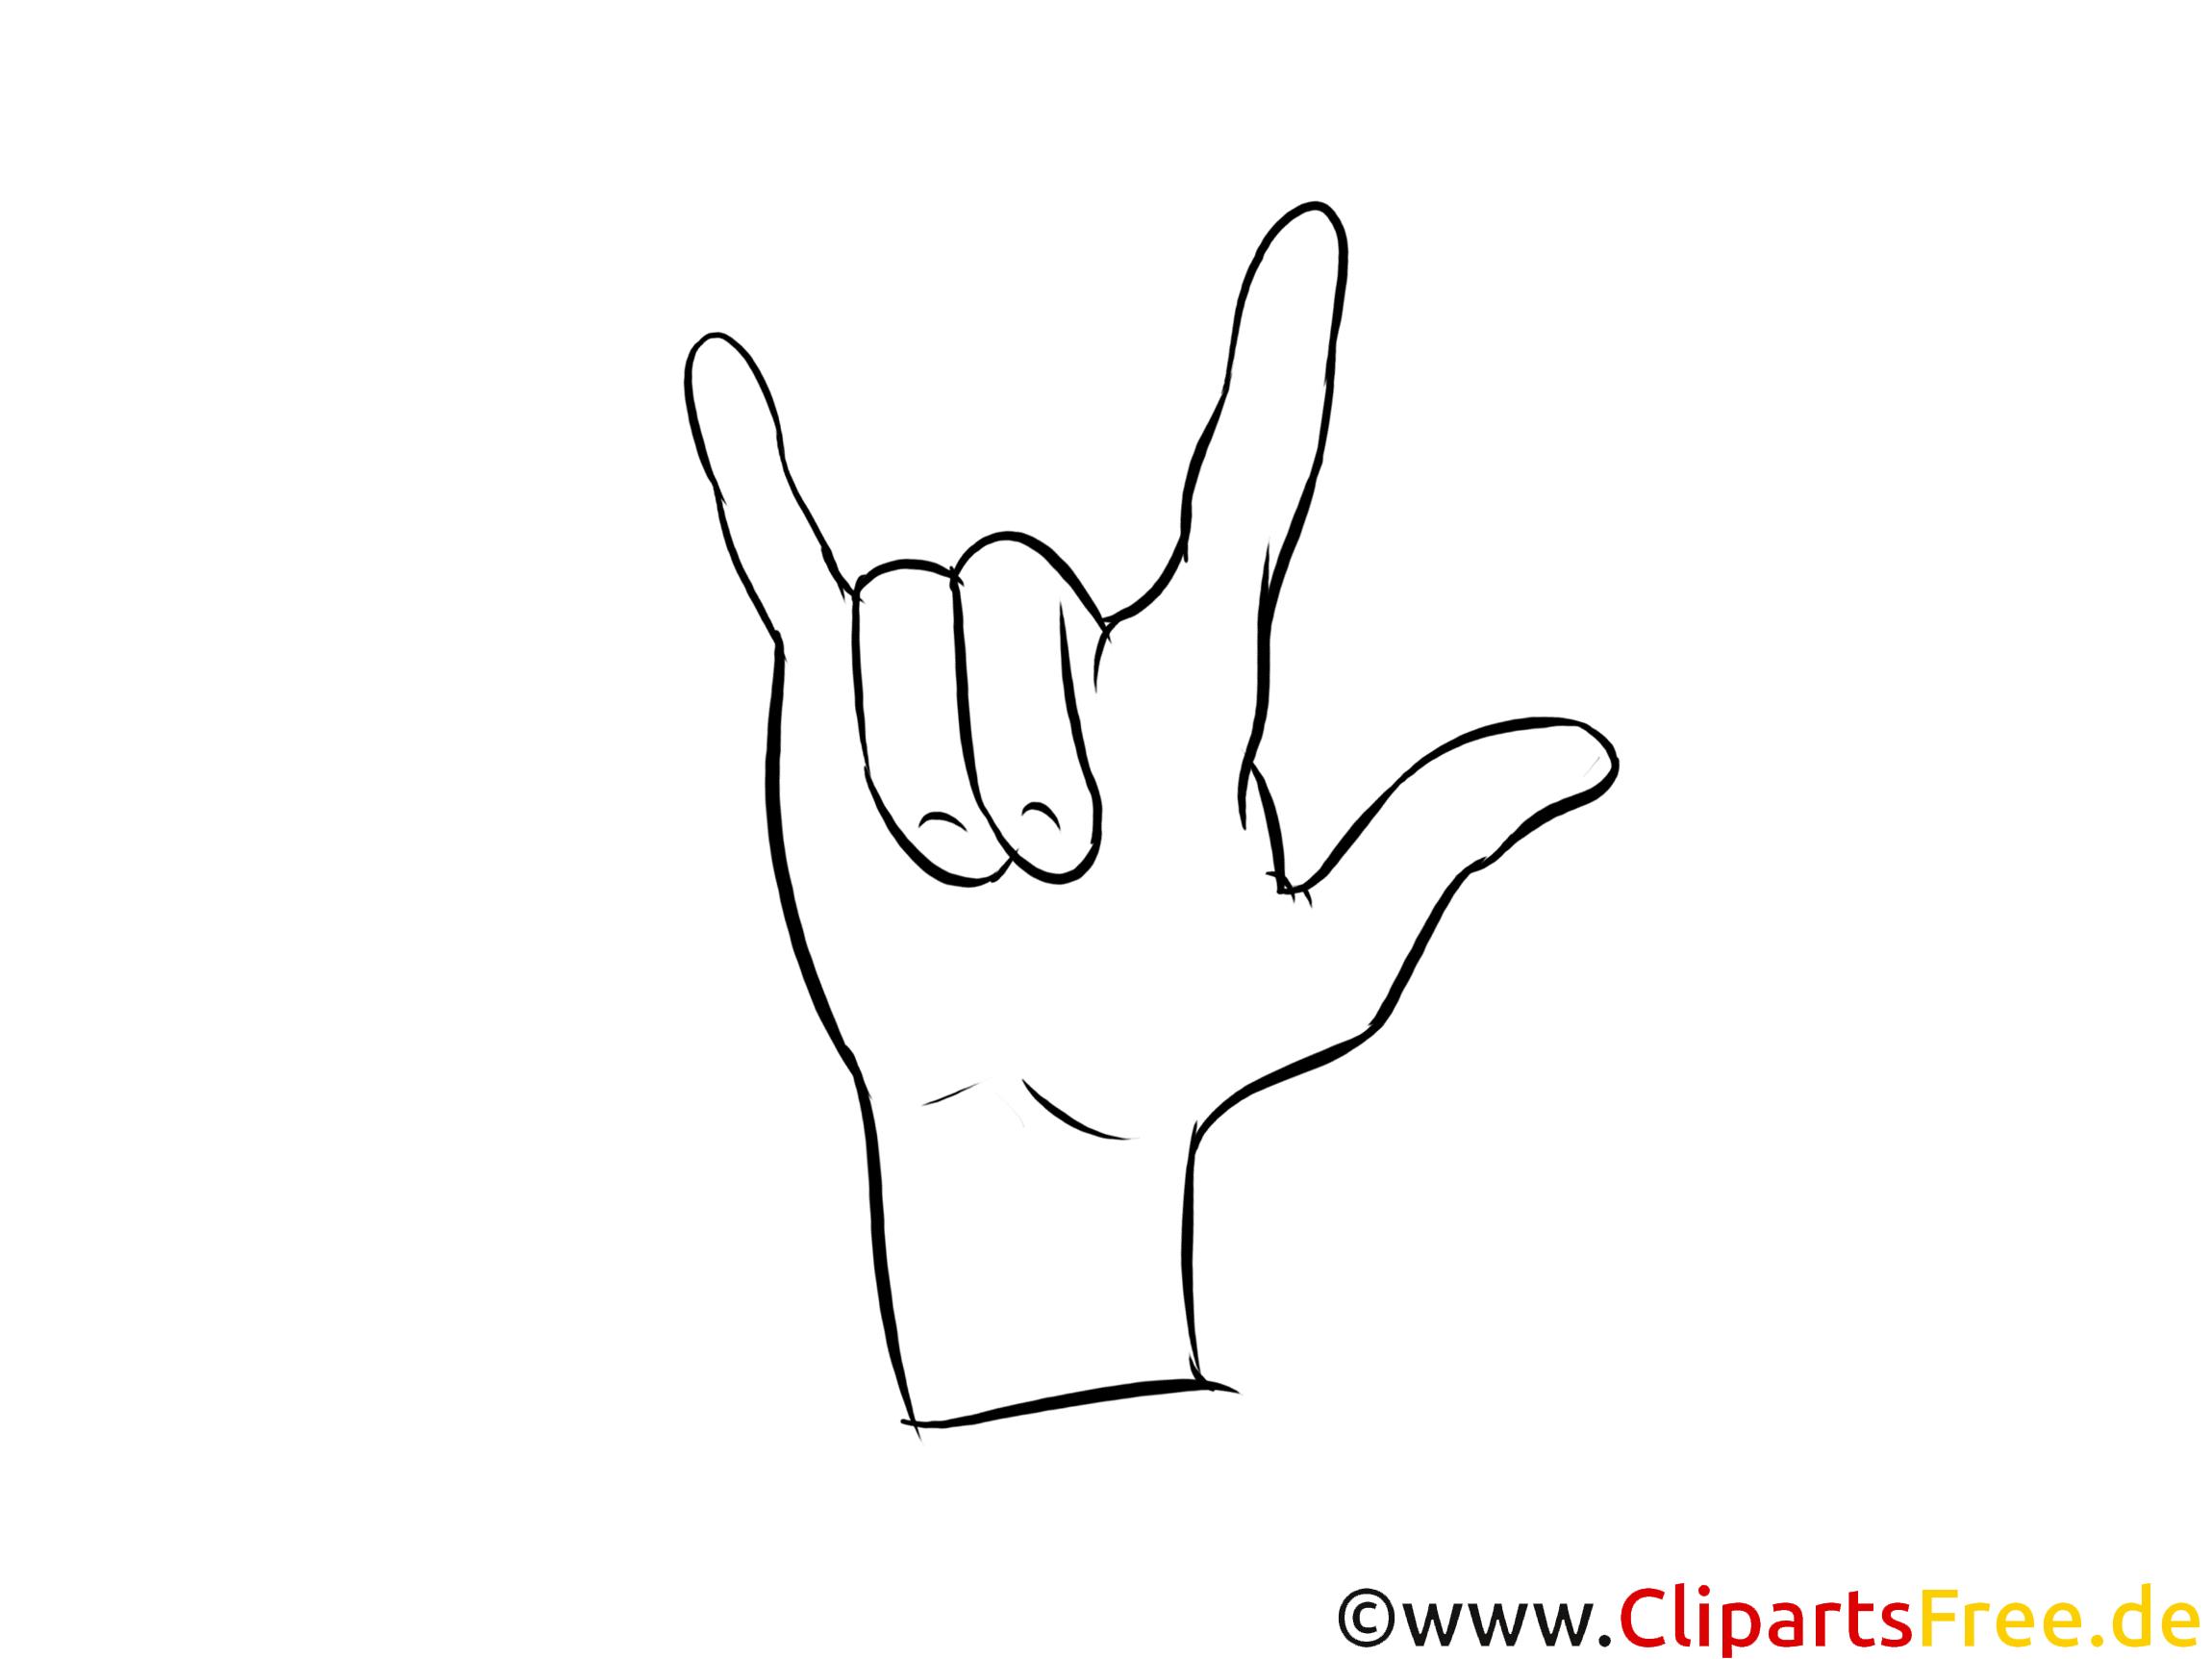 Finger Hand Malvorlage  Coloring and Malvorlagan